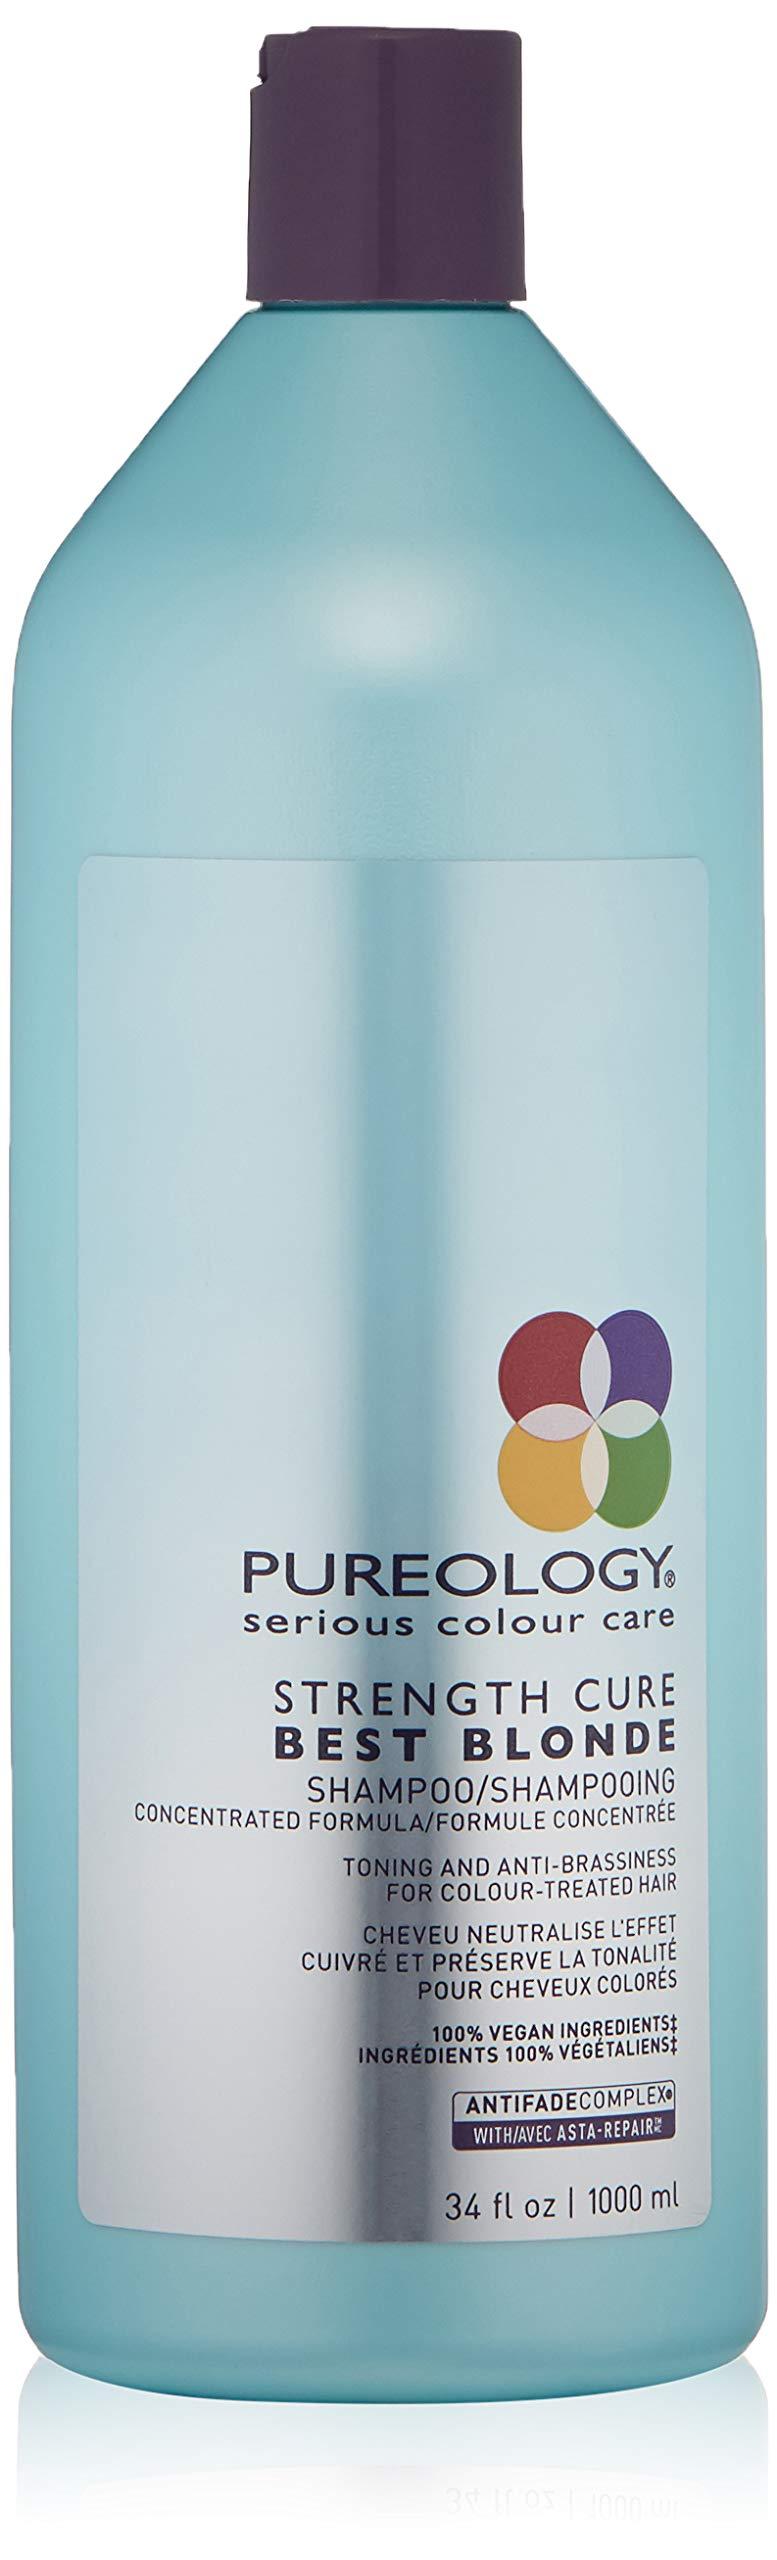 Pureology Strength Cure Best Blonde Purple Shampoo, 33.8 Fl Oz by Pureology